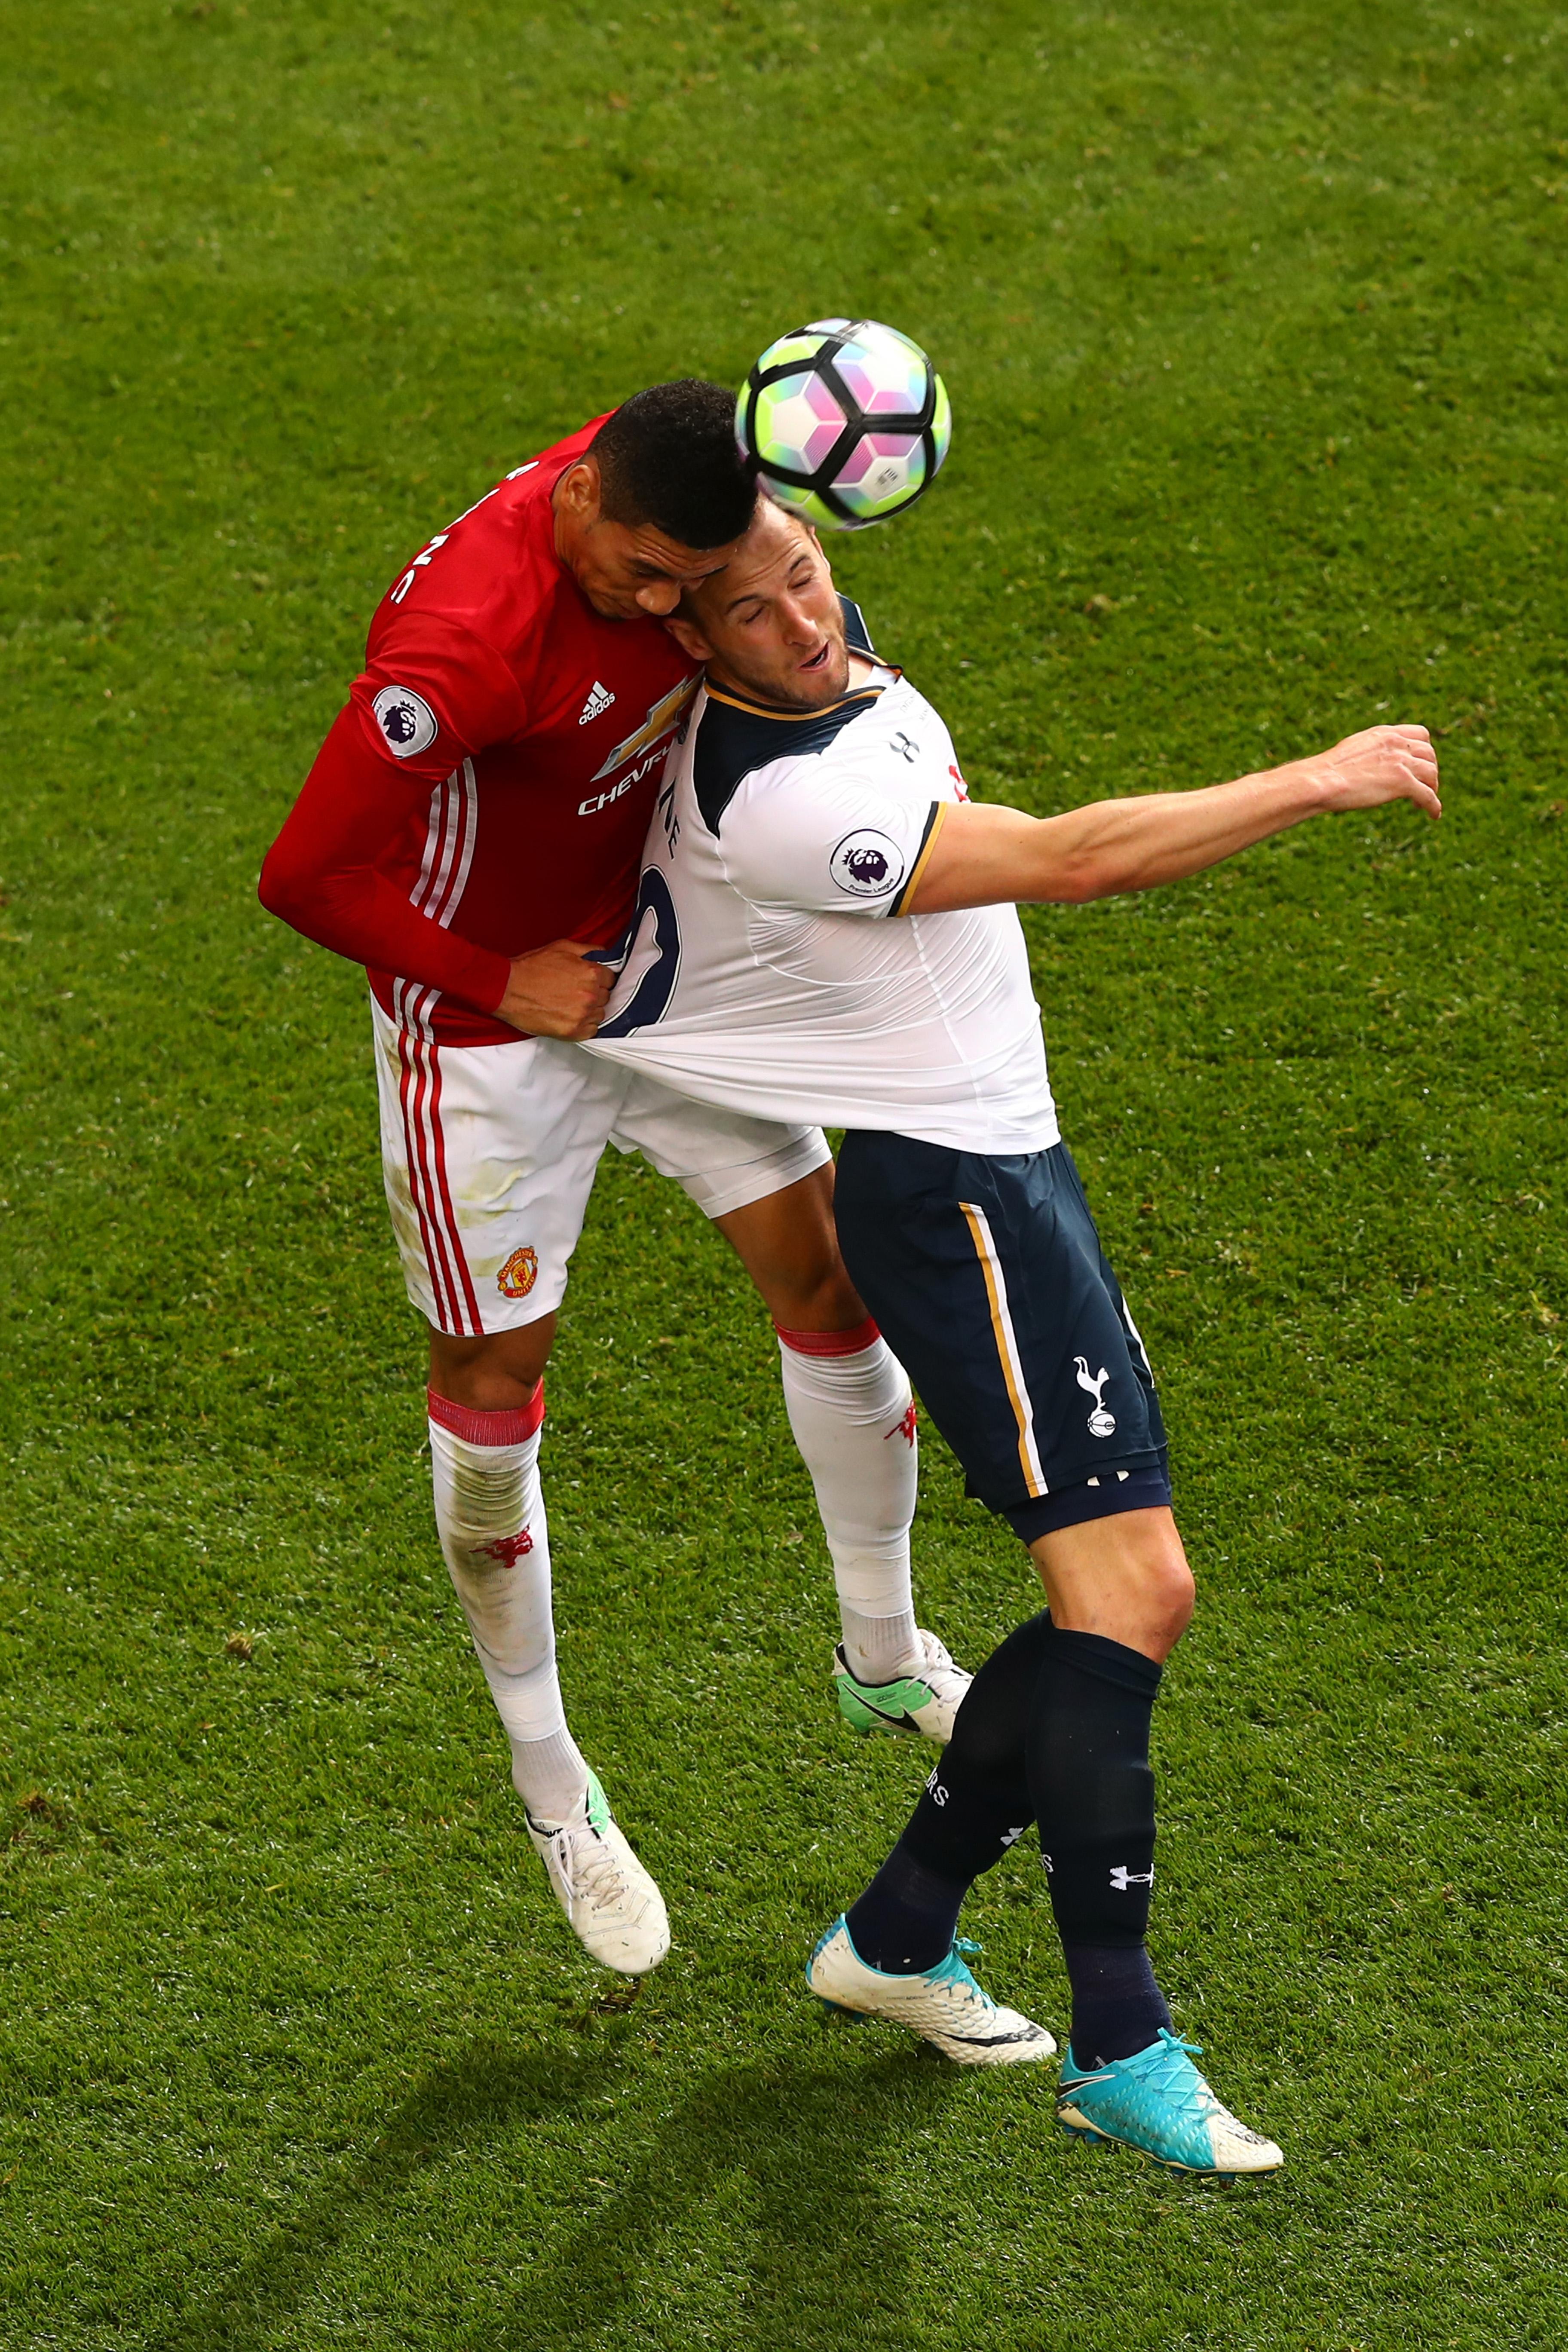 Tottenham Hotspur v Manchester United - Premier League